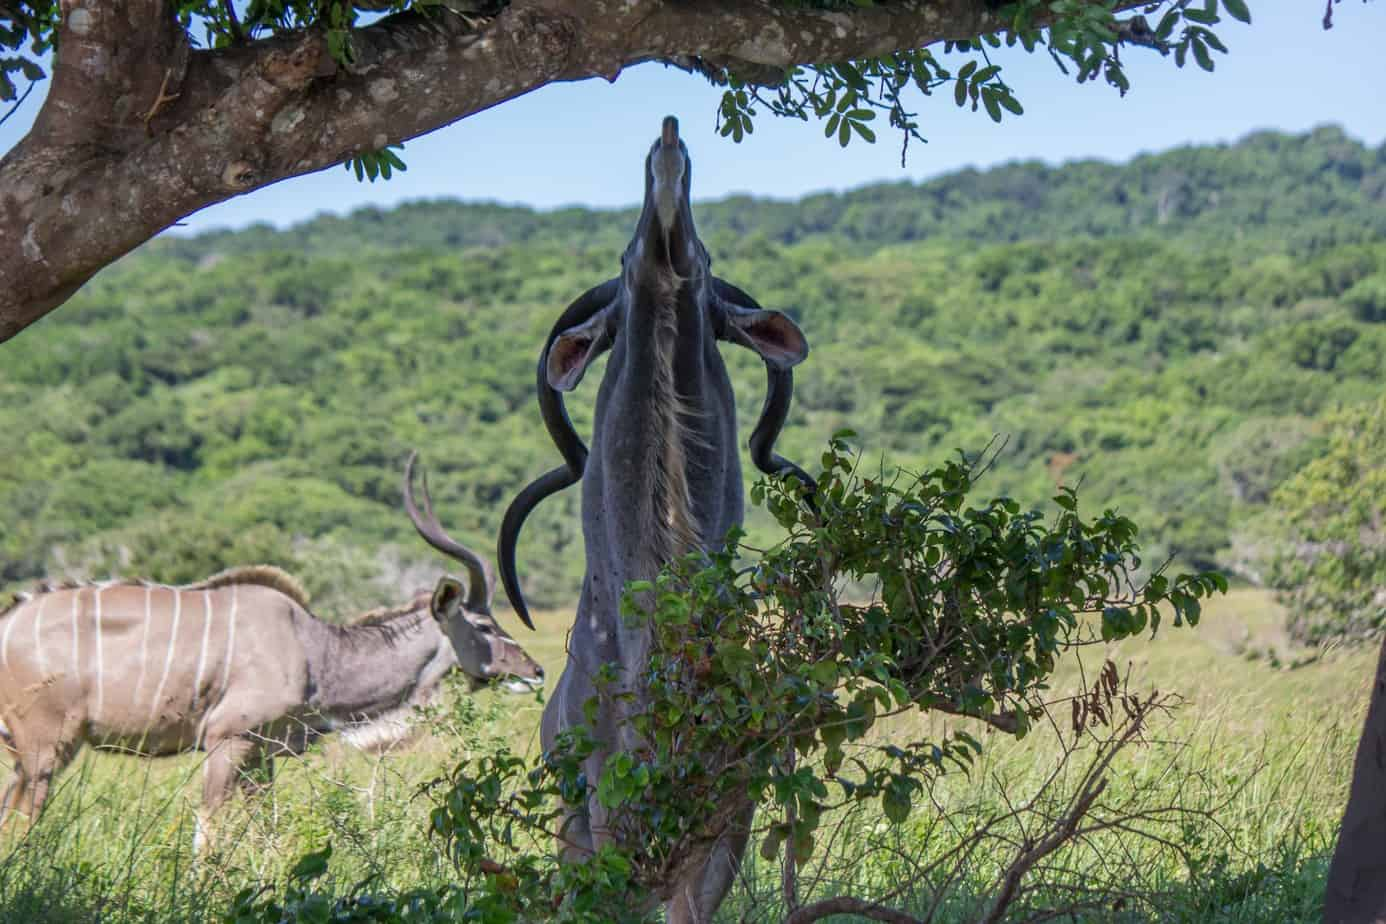 Greater Kudu8